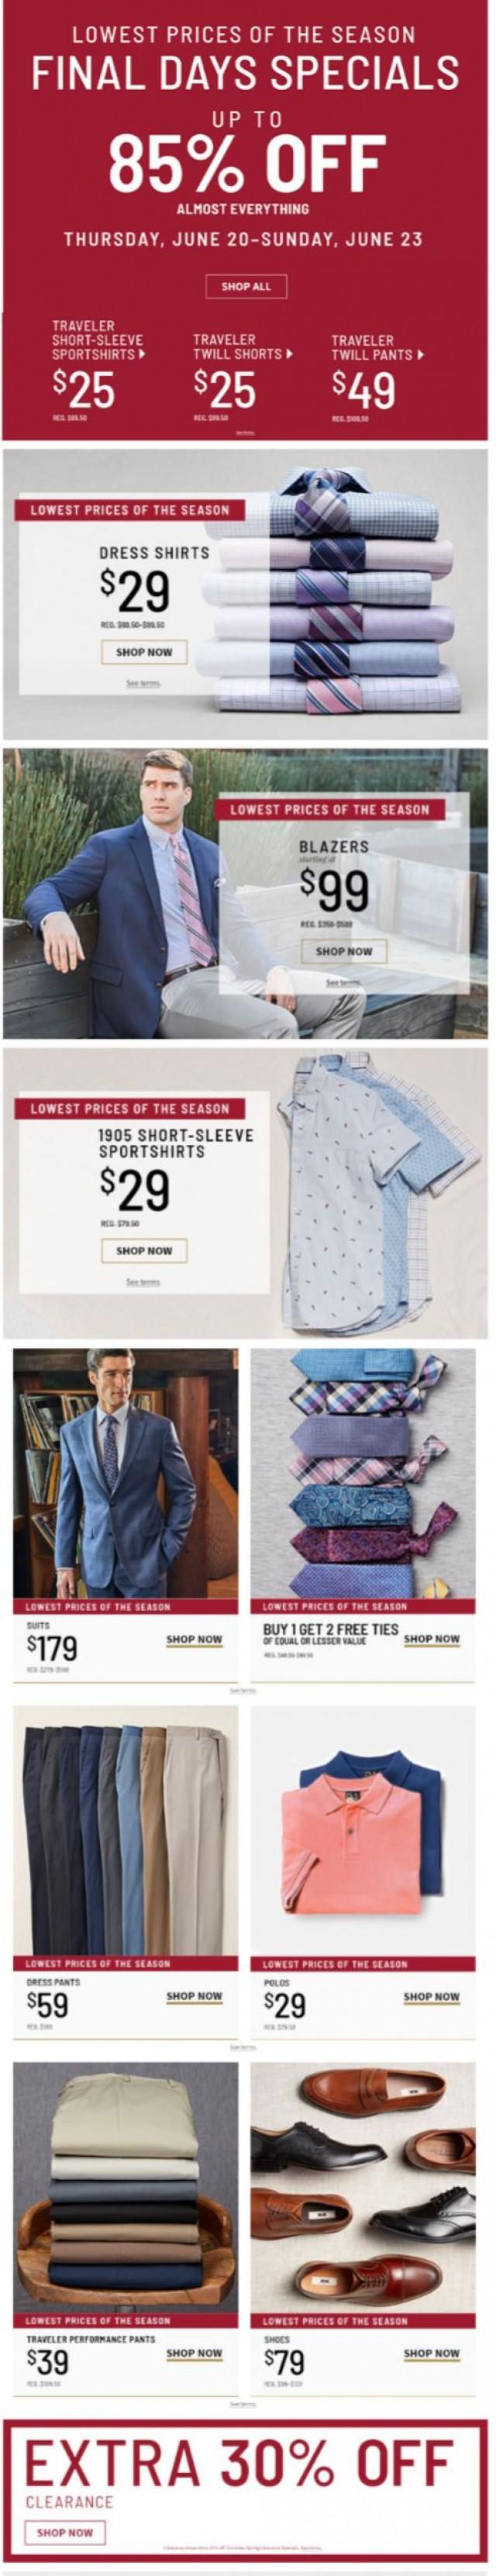 Coupon for: Jos. A. Bank - $29 Dress Shirts & Sportshirts